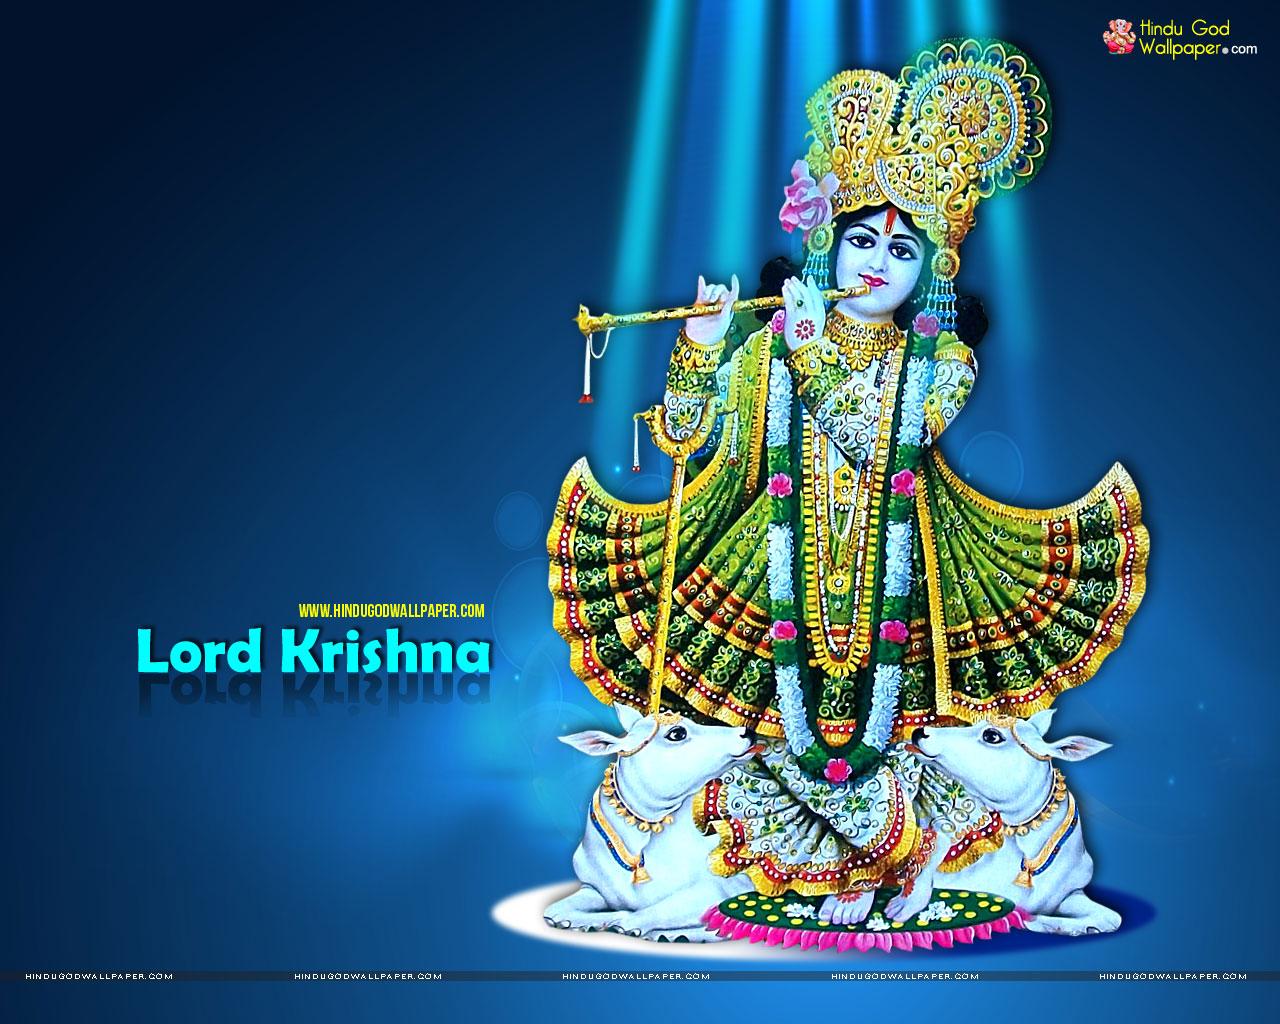 hindu god wallpapers: lord krishna high resolution